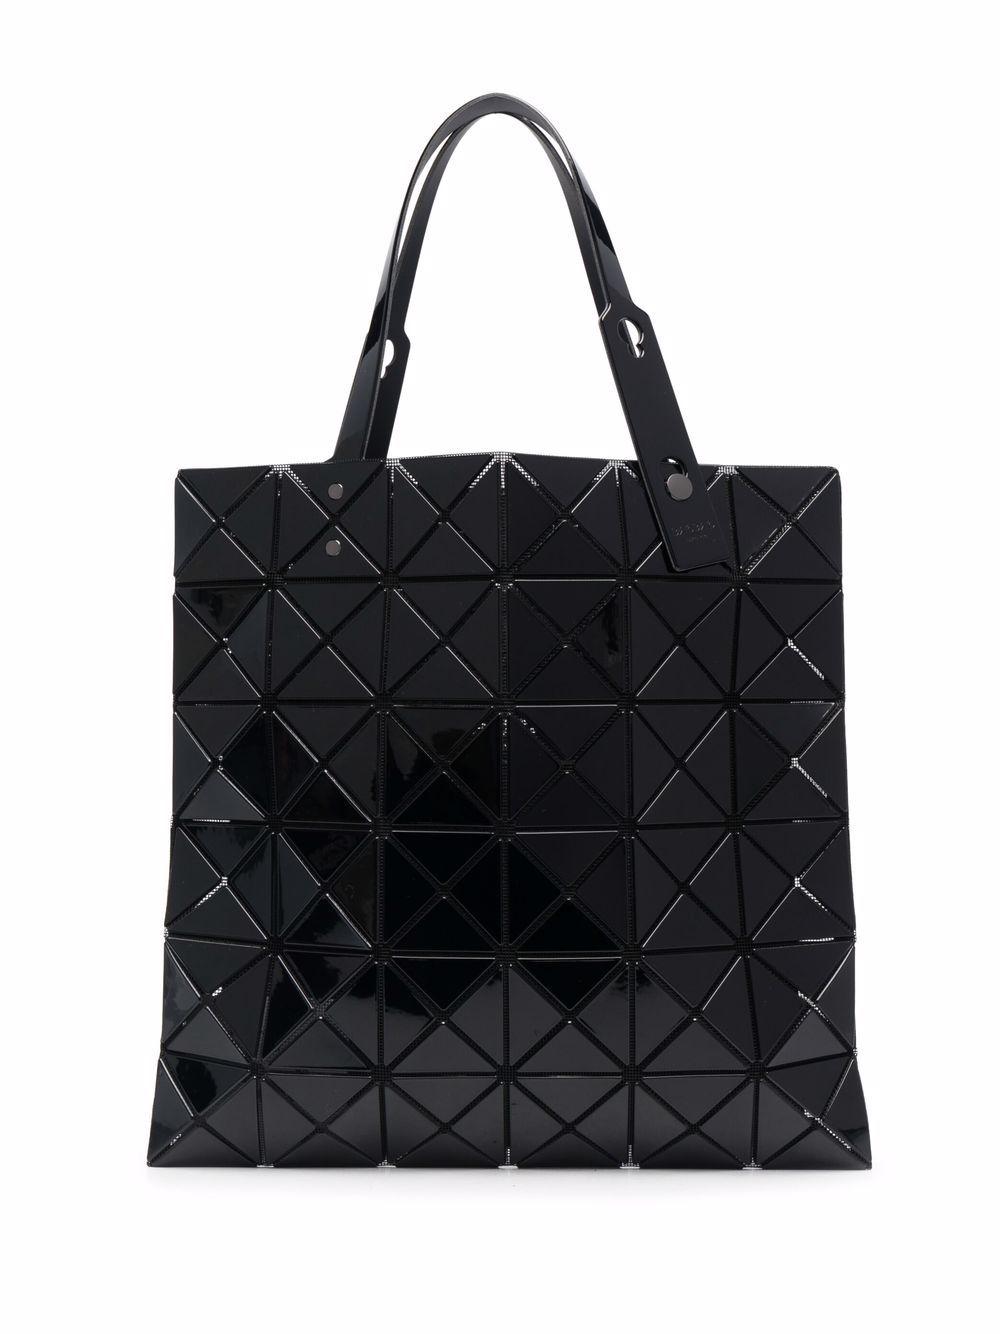 BAOBAO ISSEY MIYAKE- Lucent Tote Bag- Woman- Uni - Black